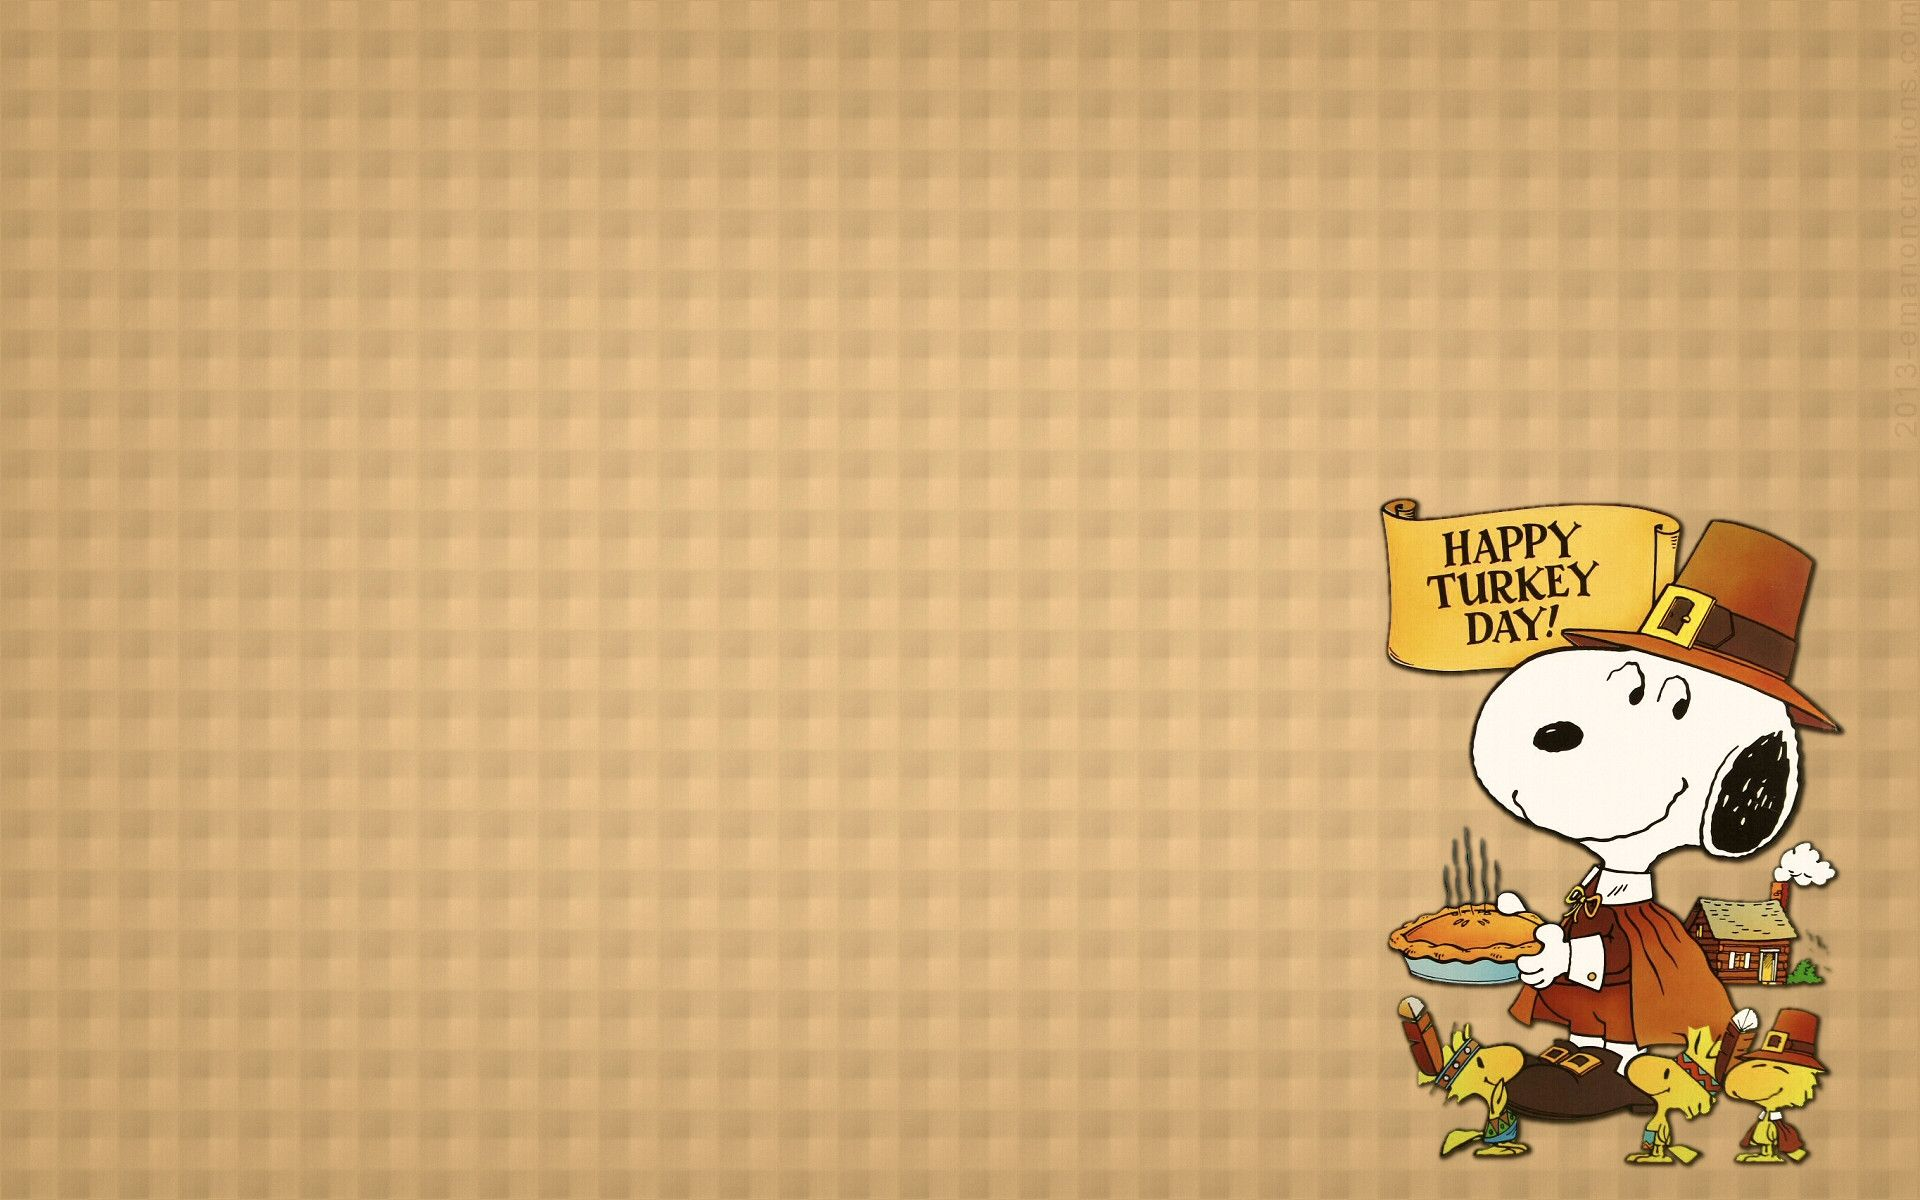 Peanuts thanksgiving wallpaper wallpapersafari - Snoopy thanksgiving wallpaper ...